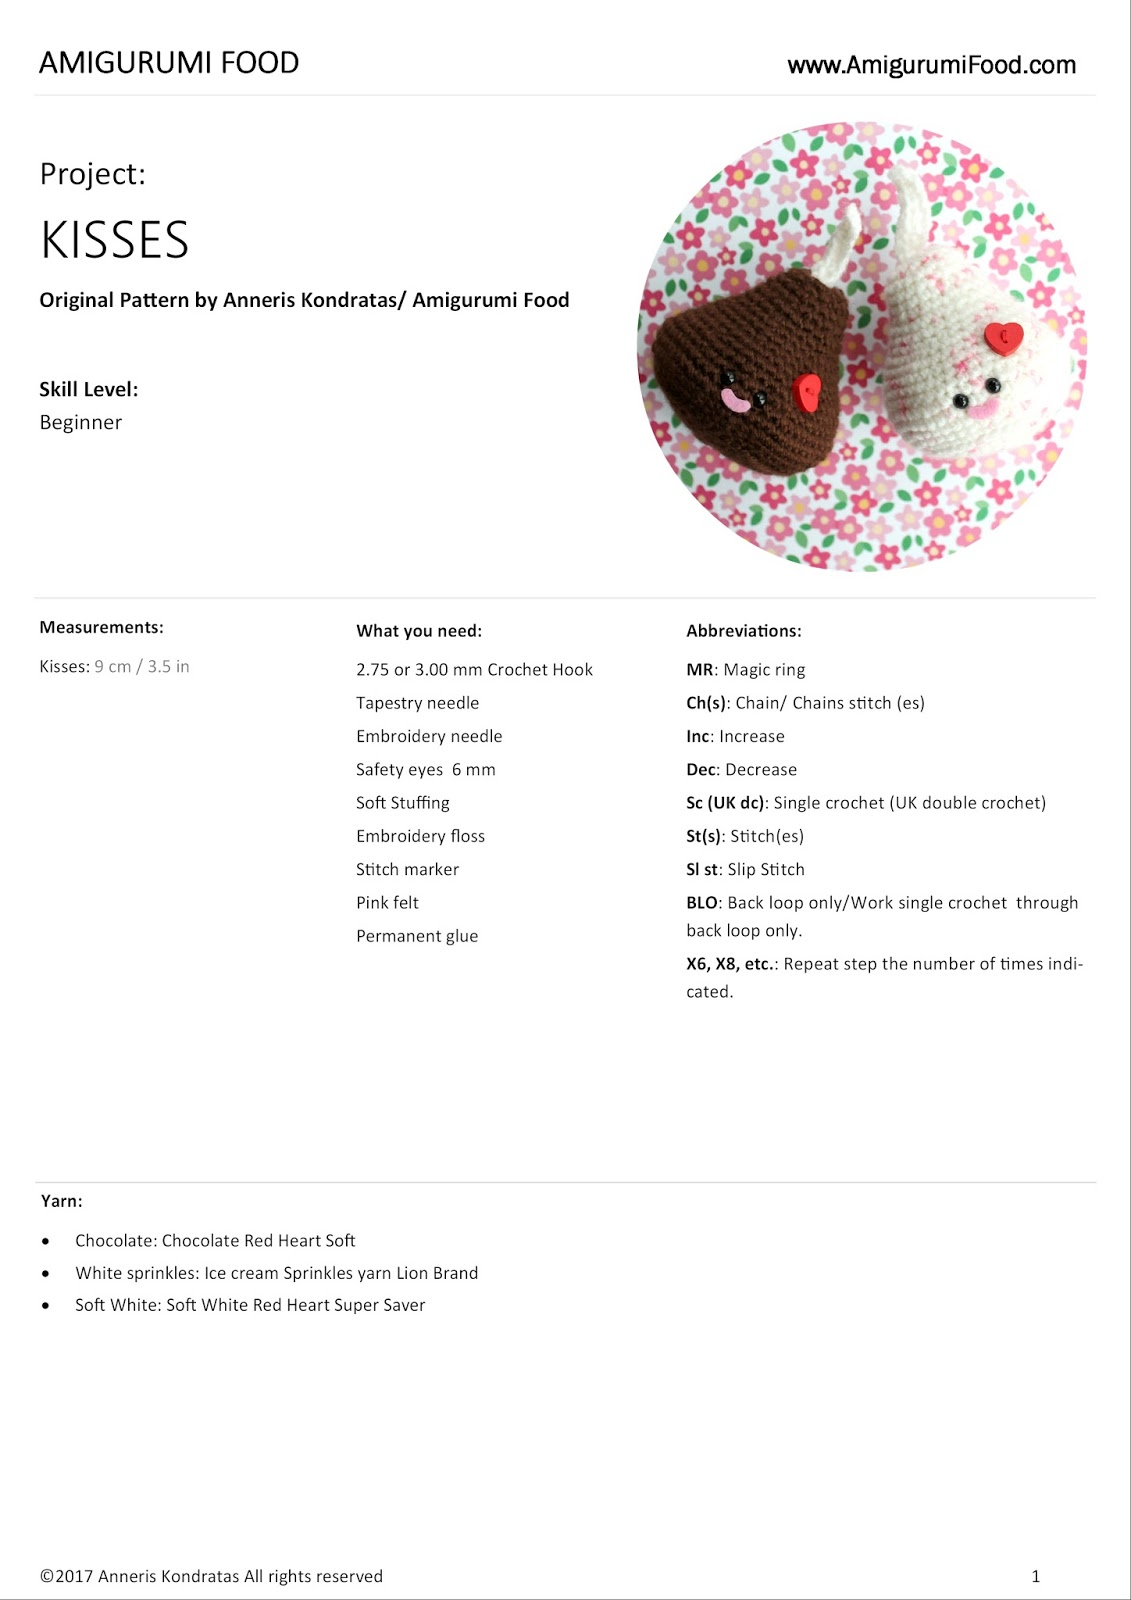 Amigurumi food new free pattern valentines day kisses amigurumi new free pattern valentines day kisses amigurumi food crochet food bankloansurffo Choice Image